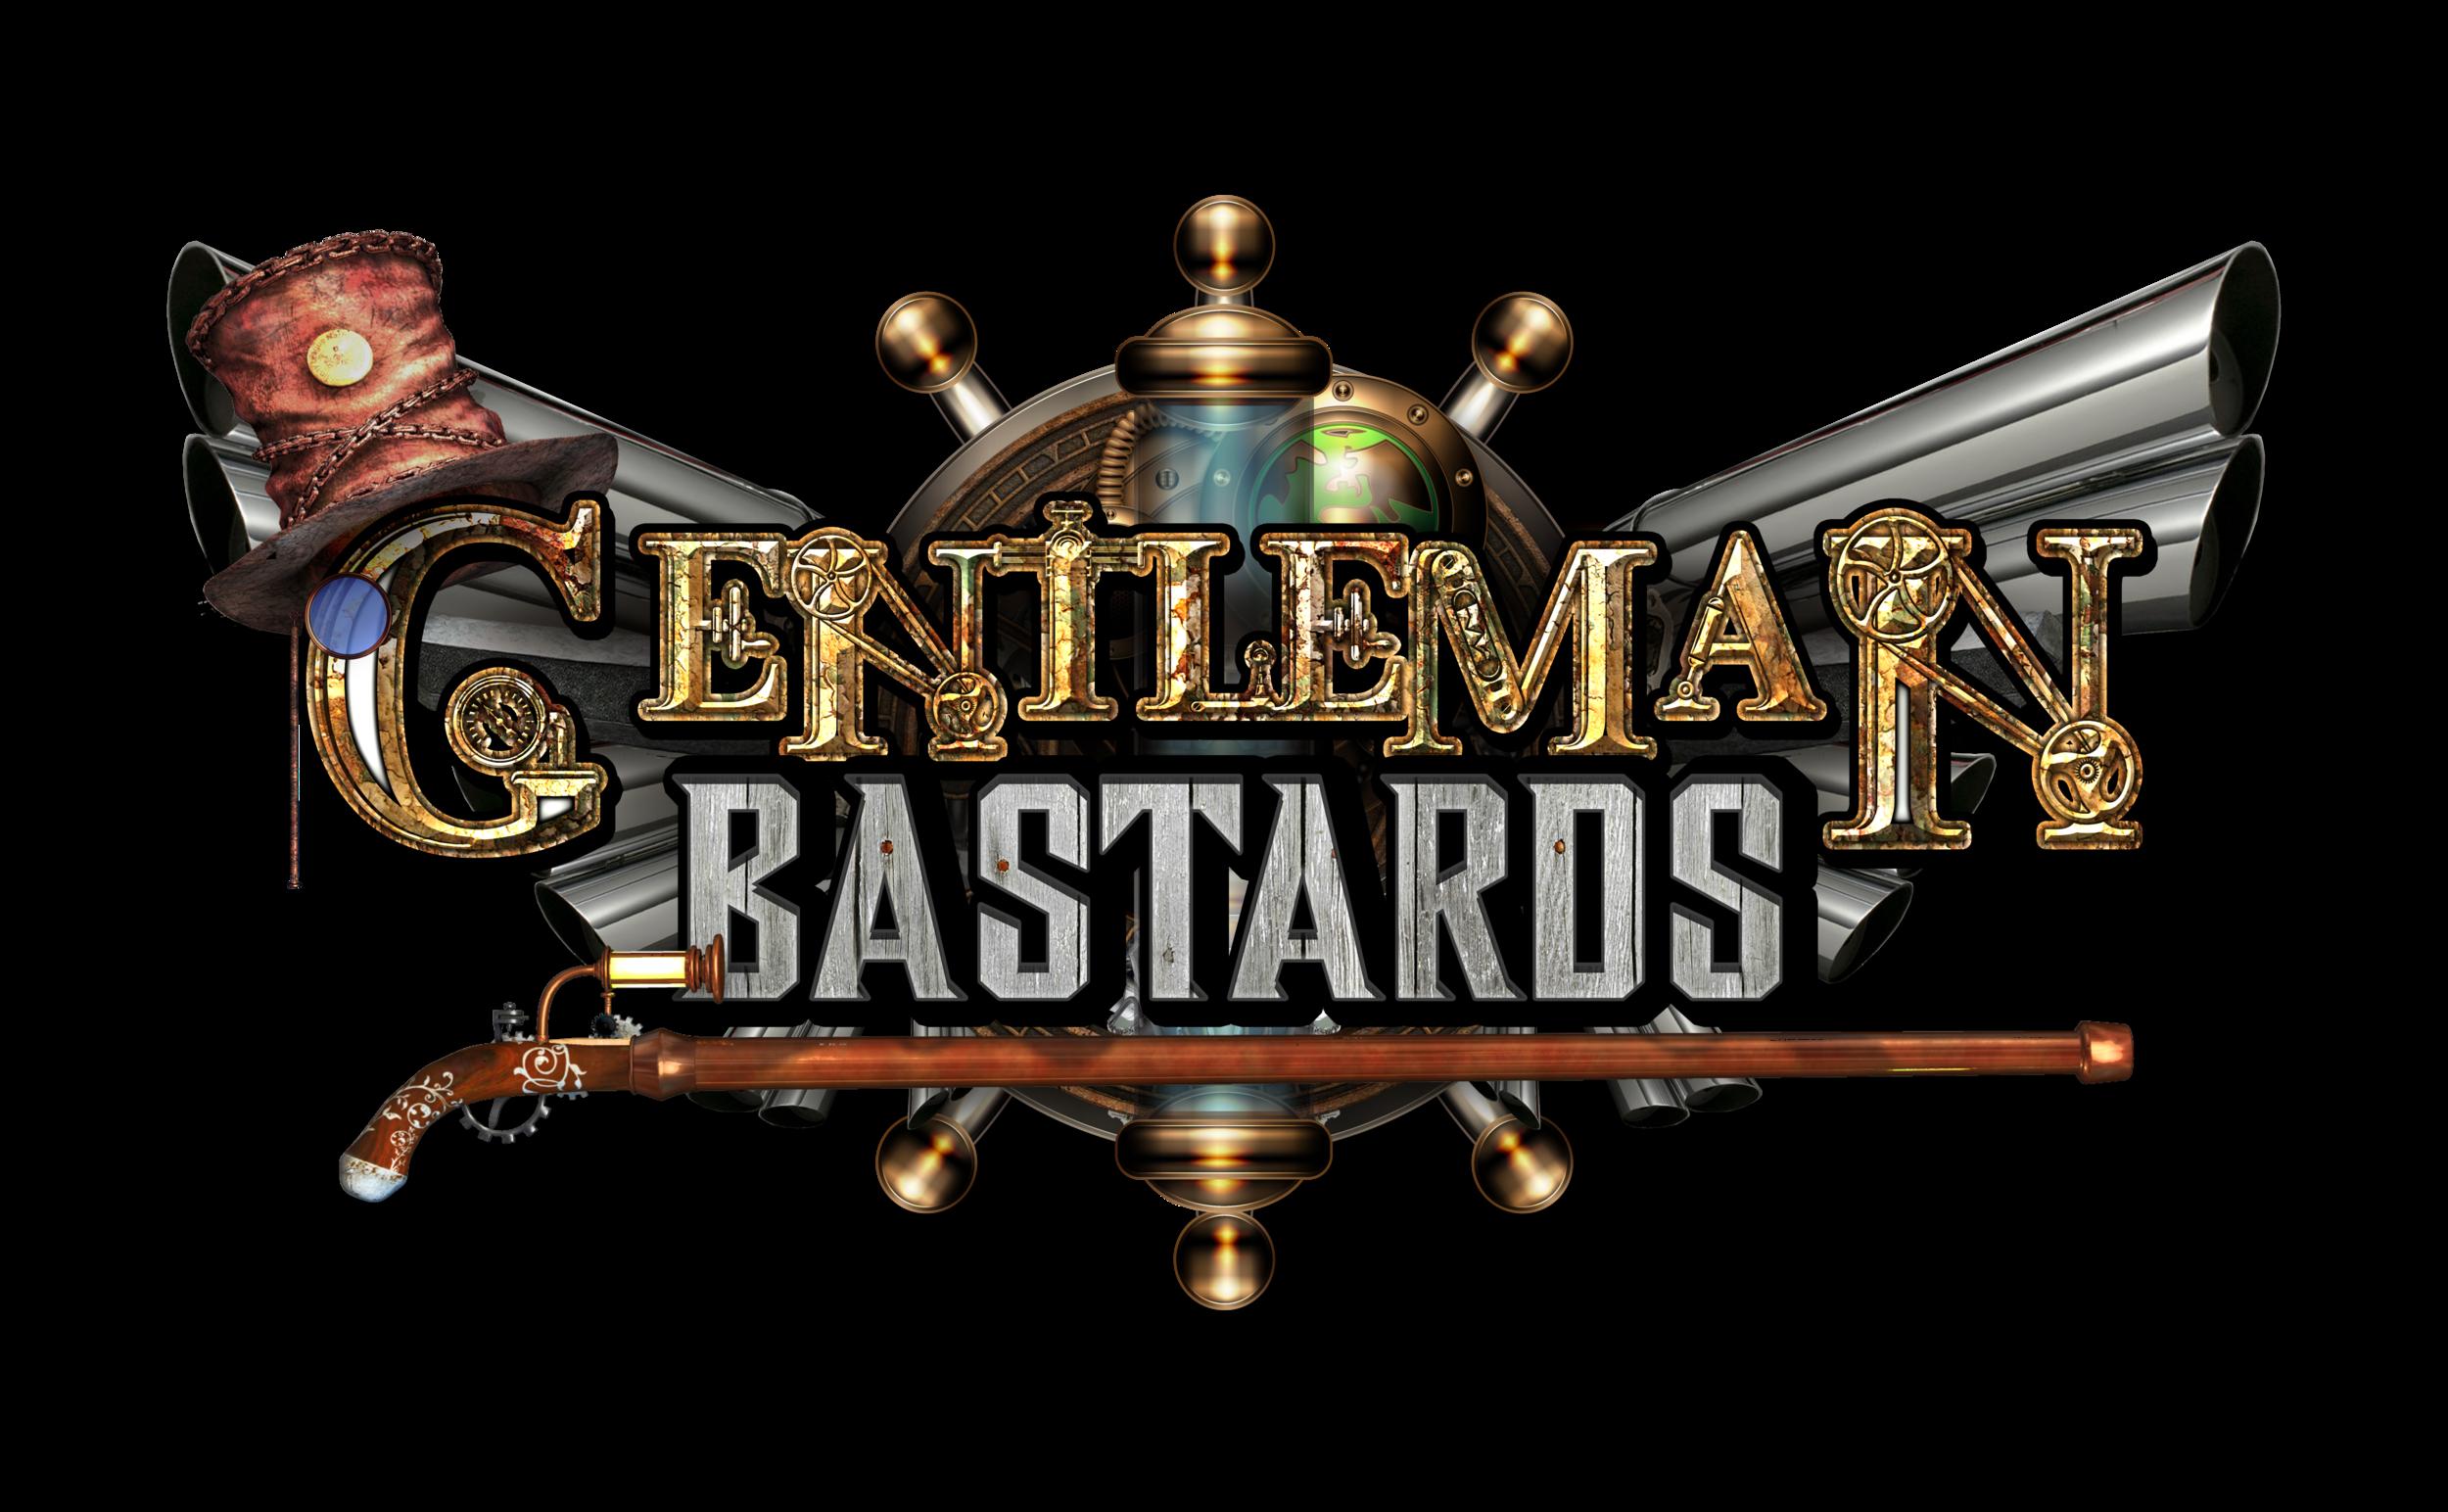 Gentleman Bastards LOGO by Ed Unitsky.png